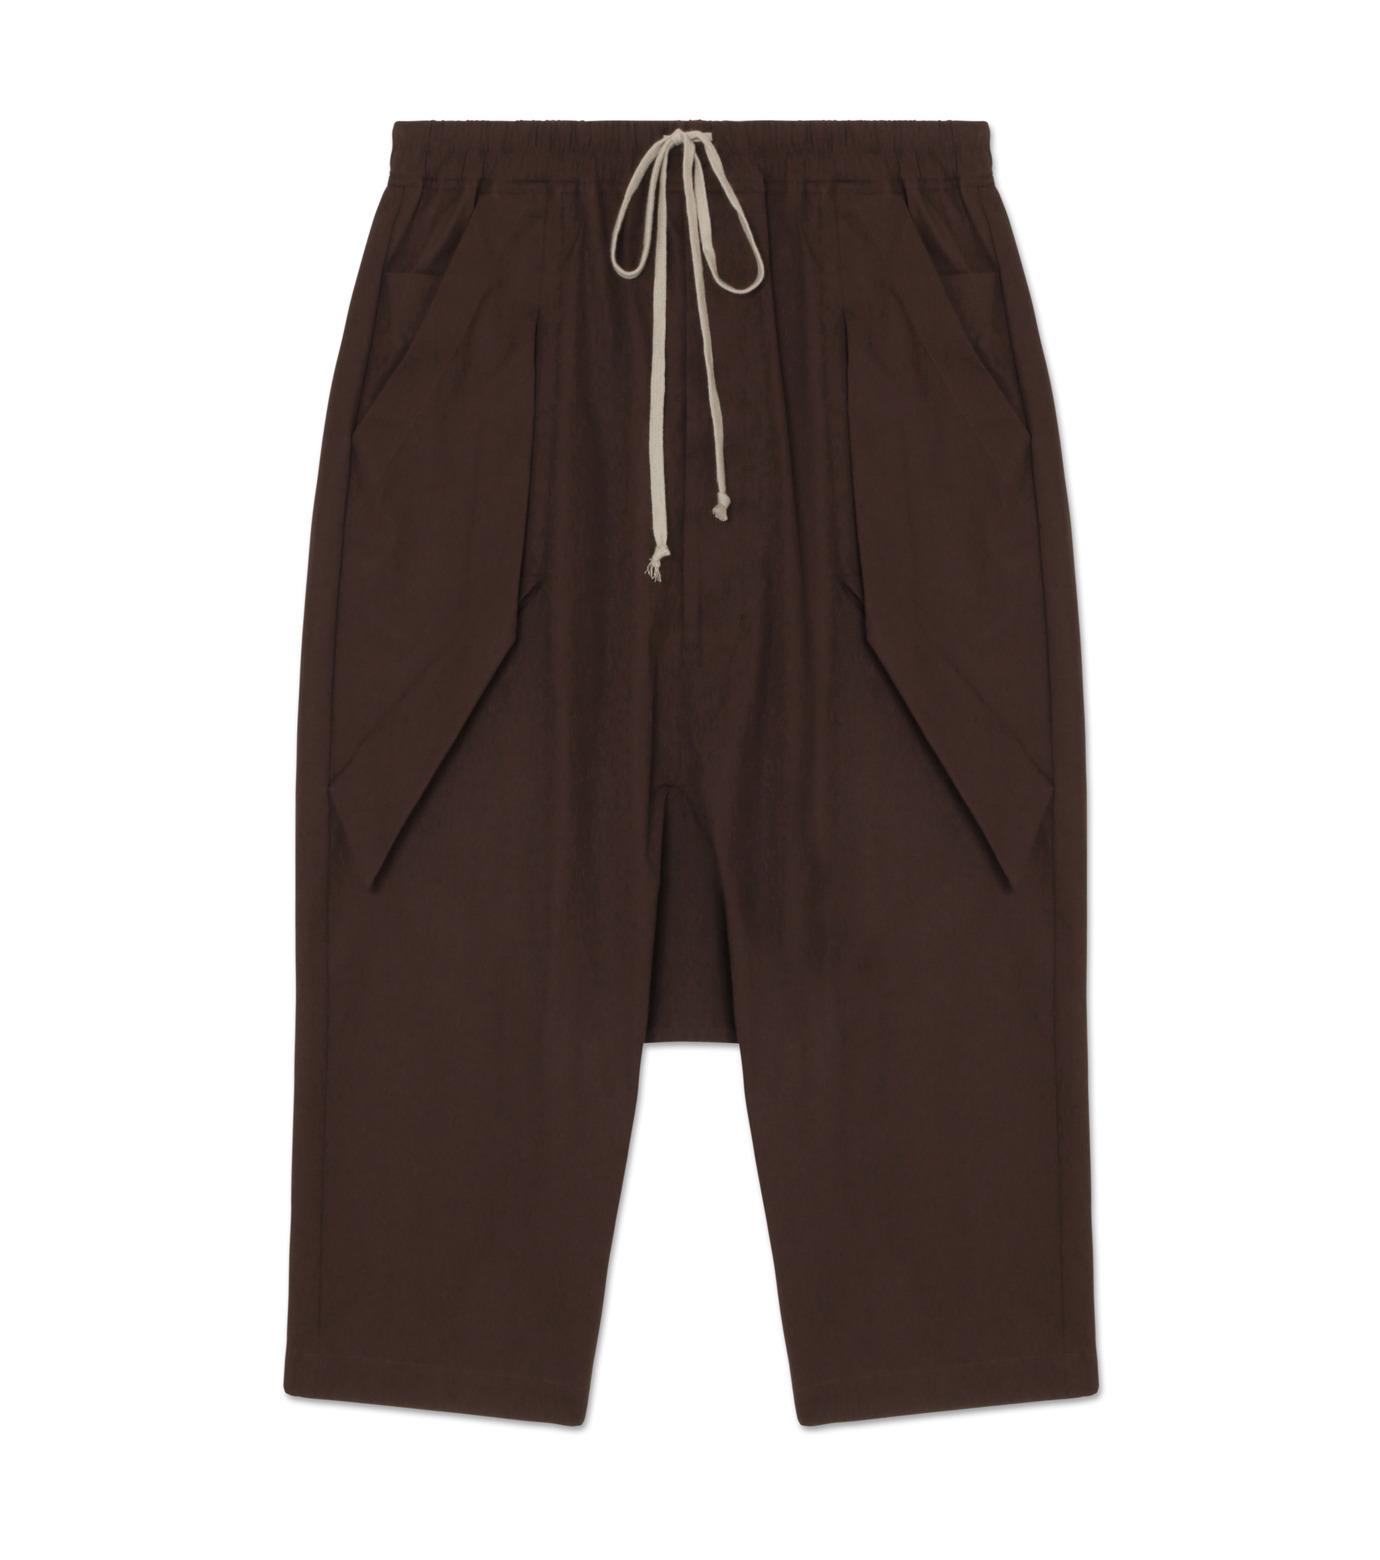 Rick Owens(リックオウエンス)のCotton Short Pants-PURPLE-RU16F6393TE-82 拡大詳細画像1